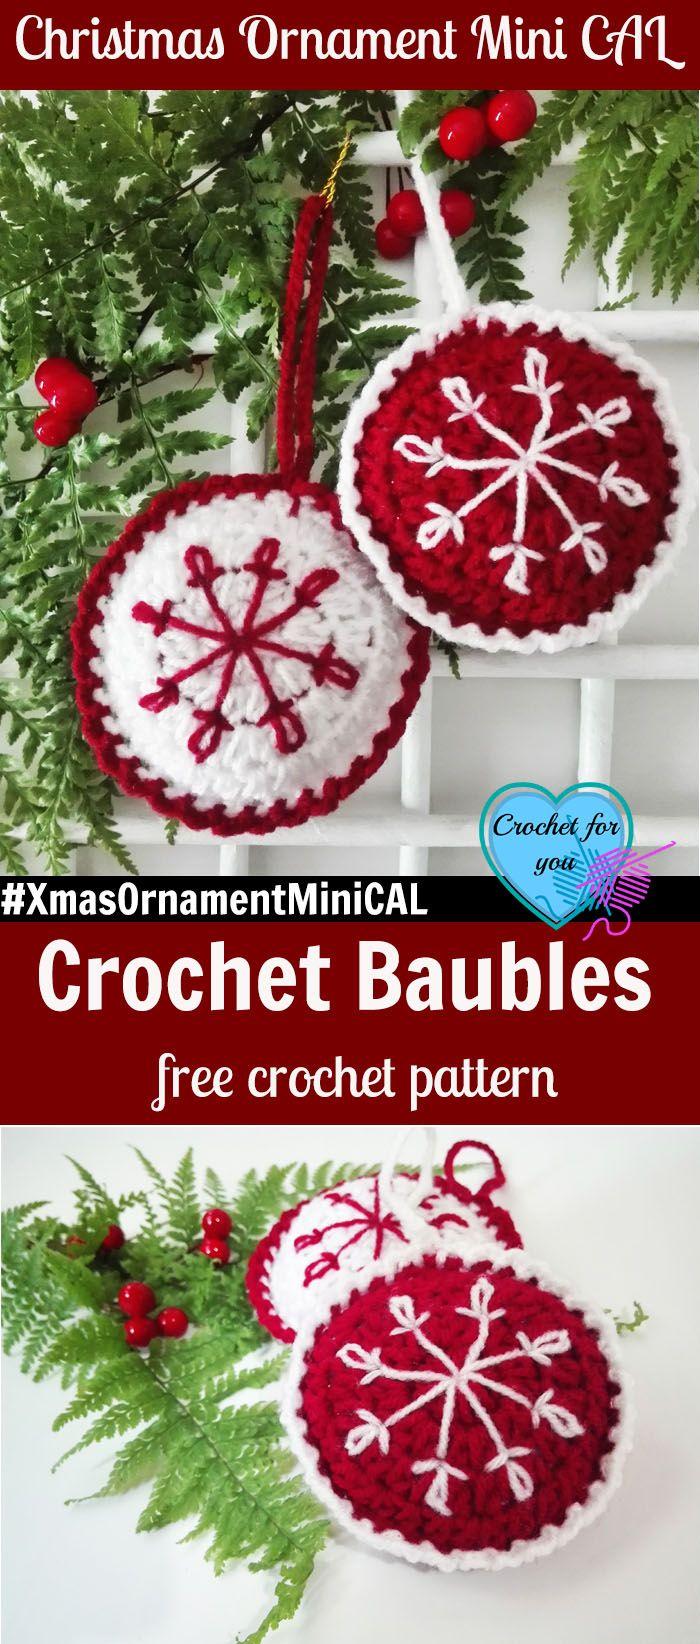 Christmas Ornament Mini CAL - Crochet Baubles. #XmasOrnamentMiniCAL